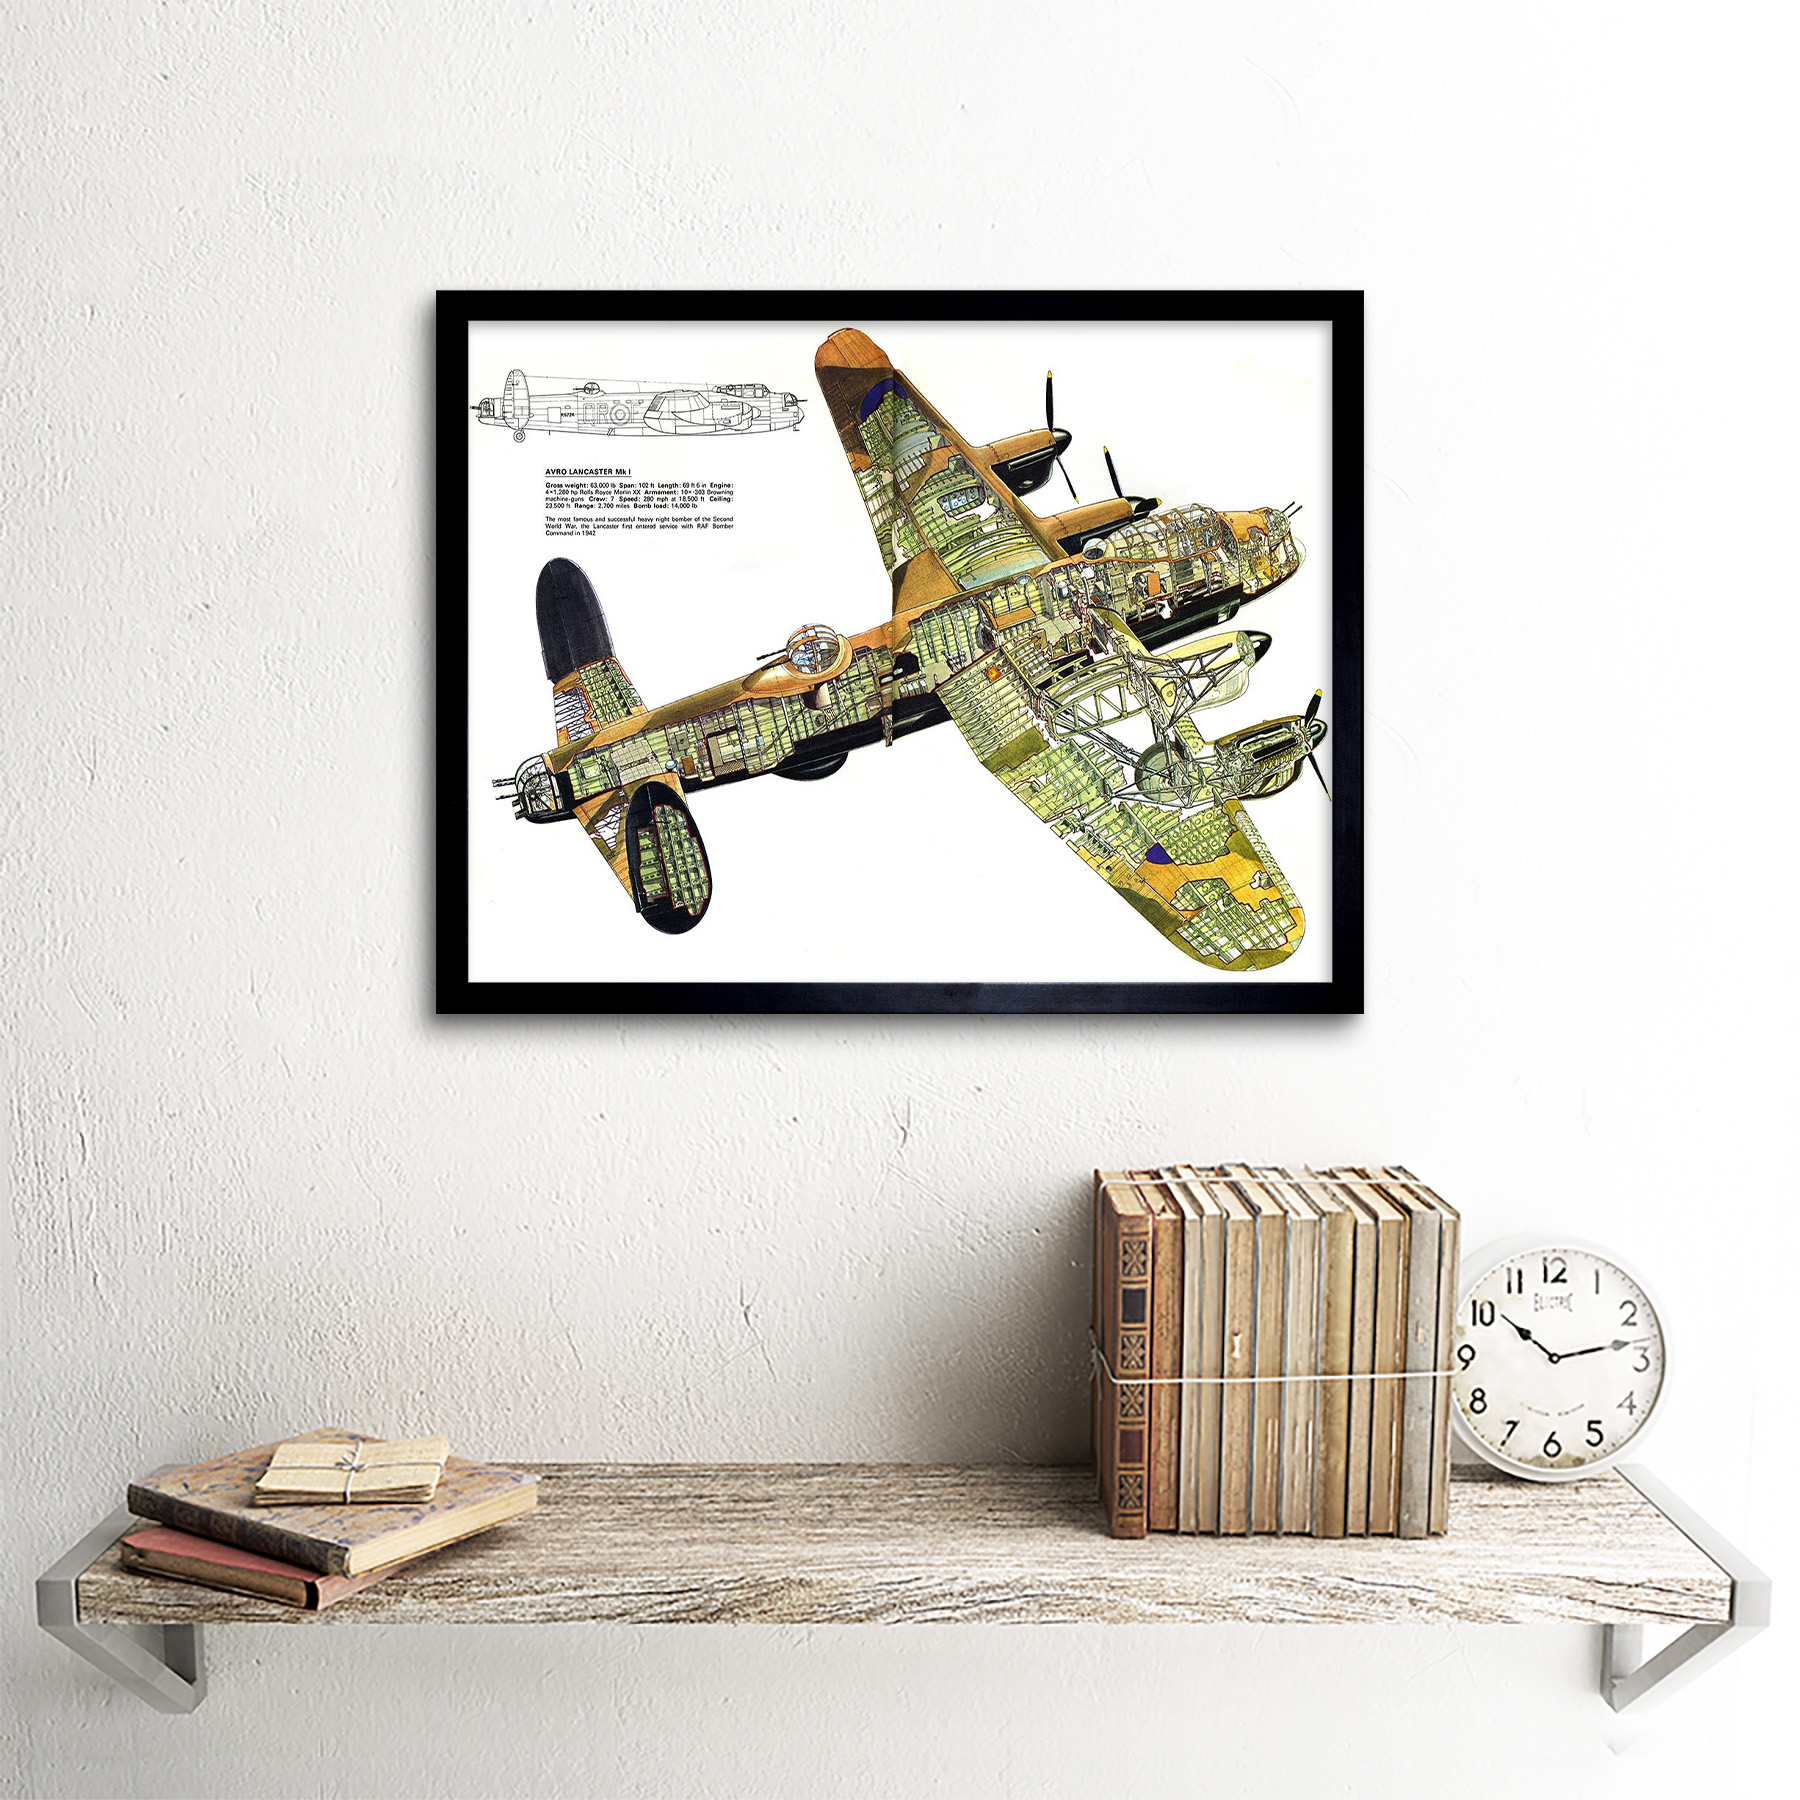 WAR PLANE BOMBER AVRO LANCASTER CUTAWAY WWII UK FRAME ART PRINT PICTURE F12X1836